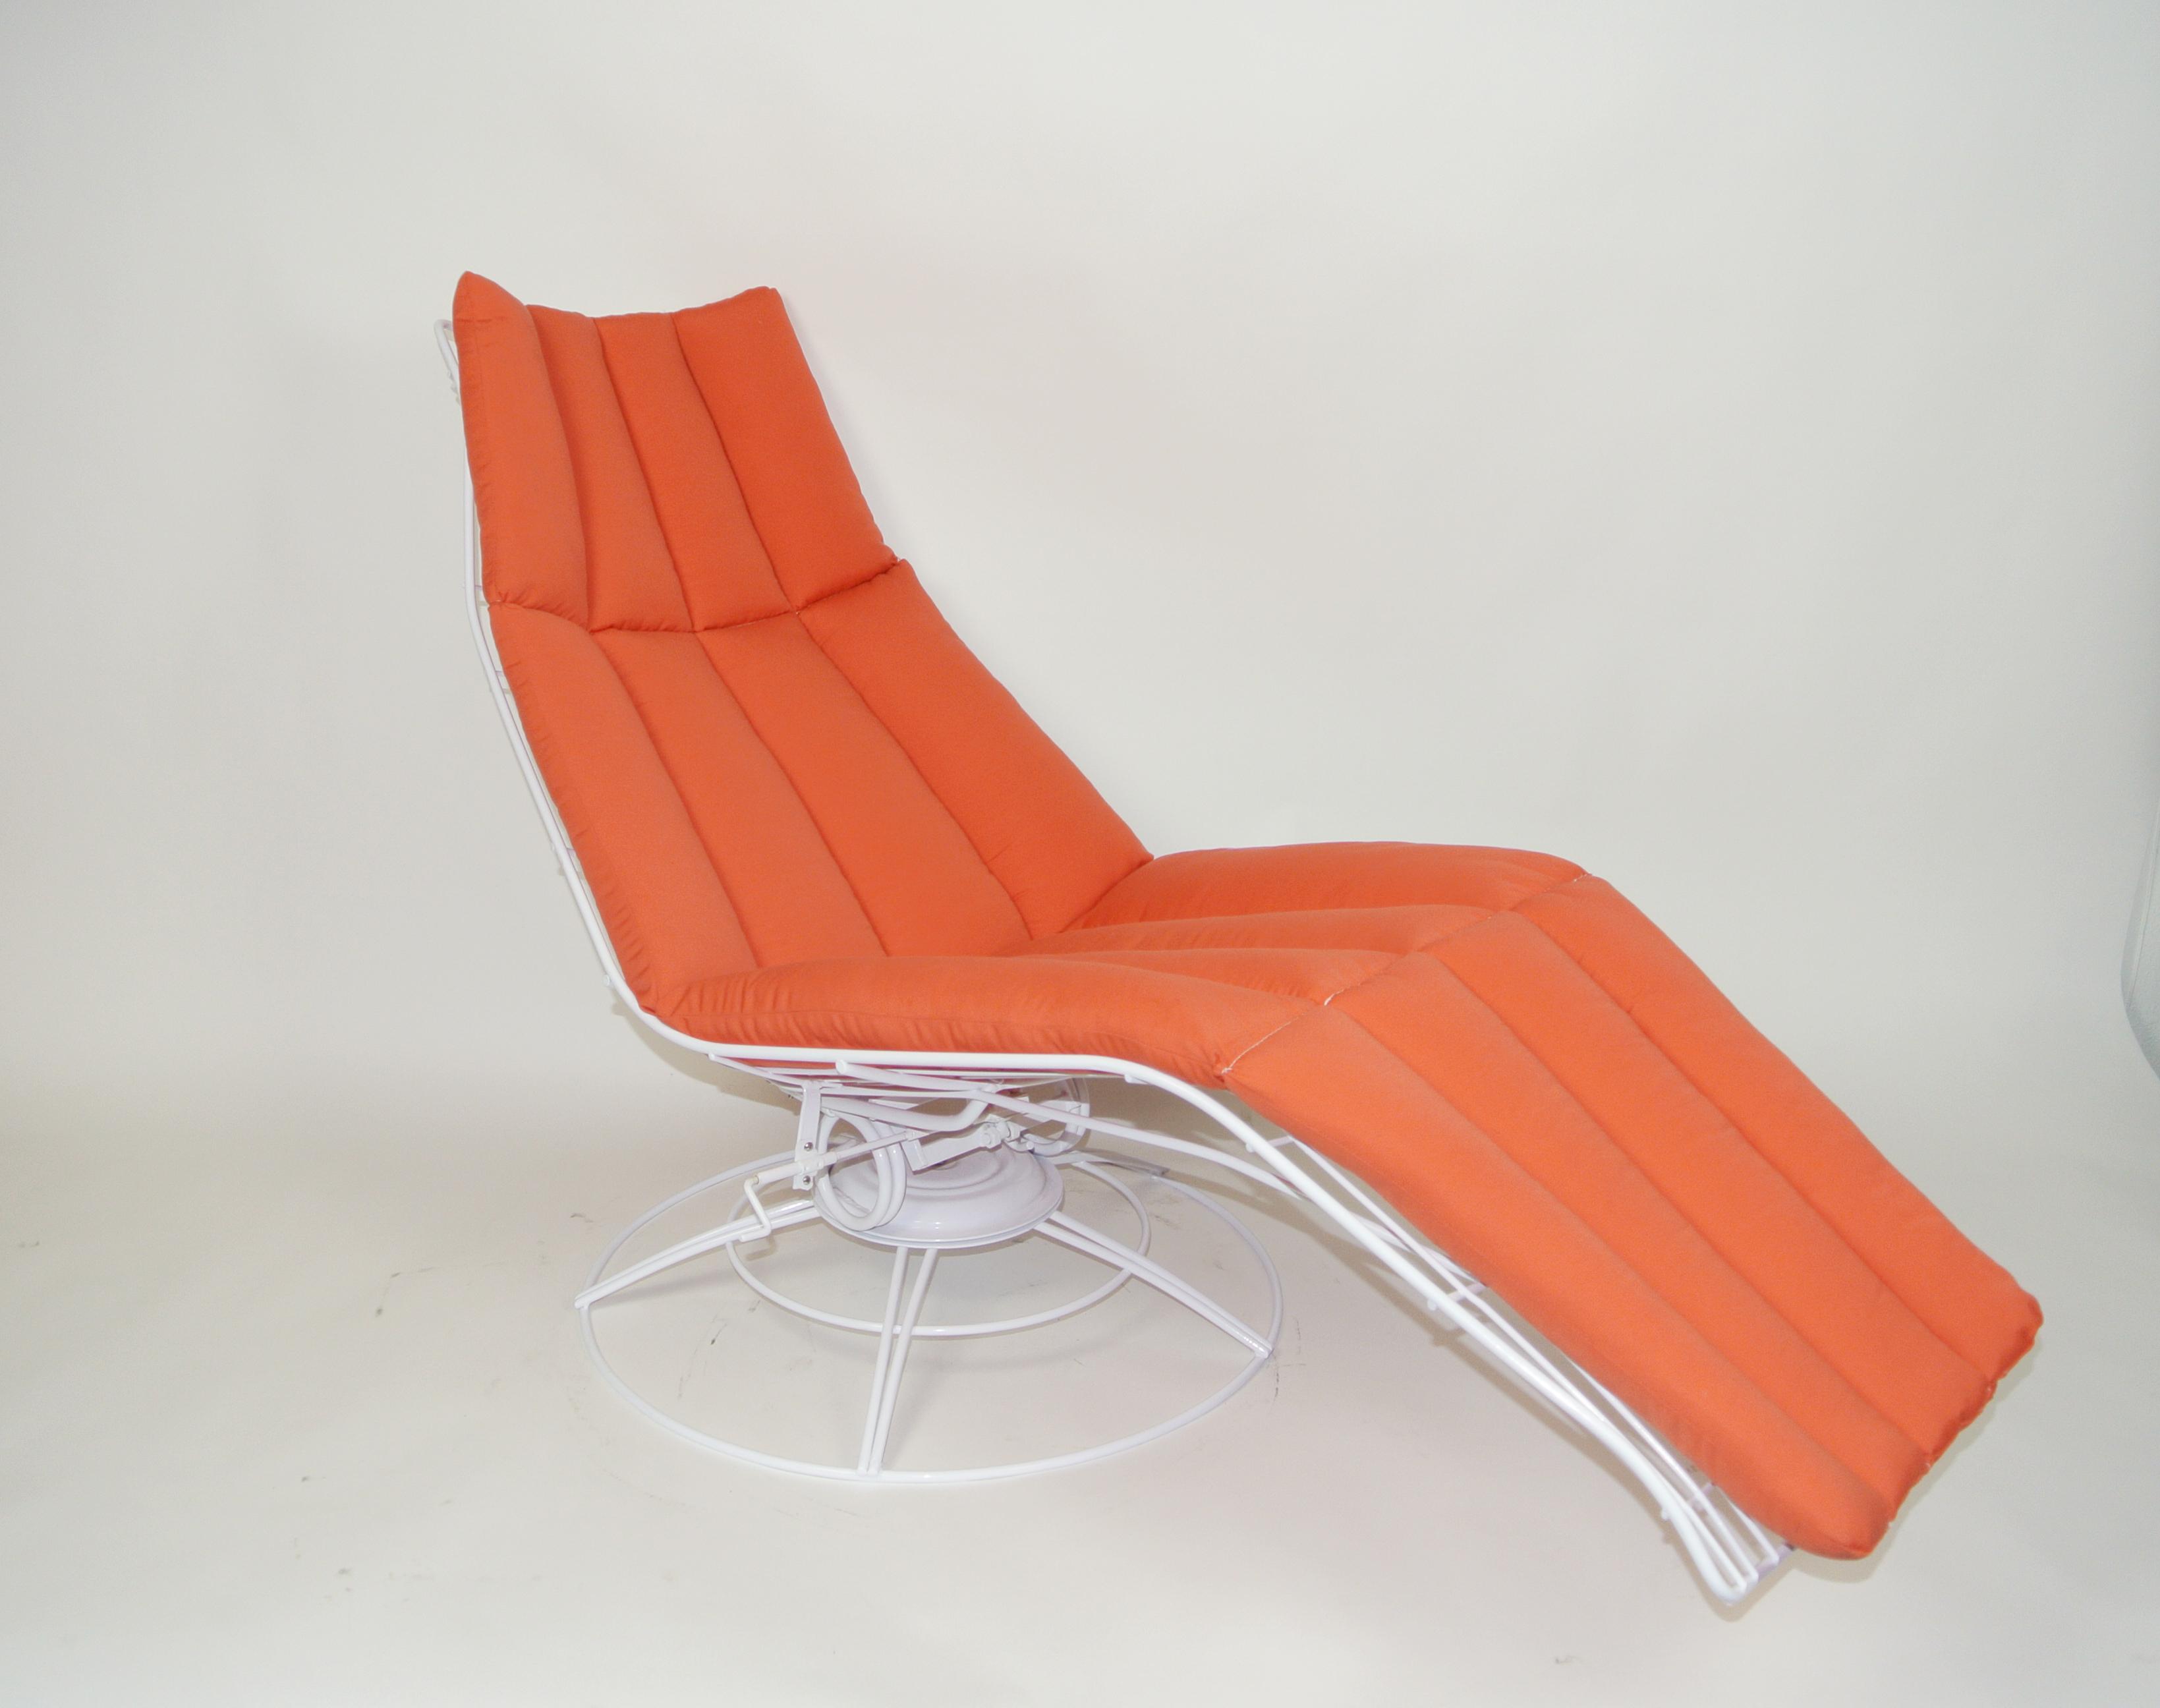 Vintage Homecrest Wire Chair Cushions Patio Furniture Refinishing Pomona C